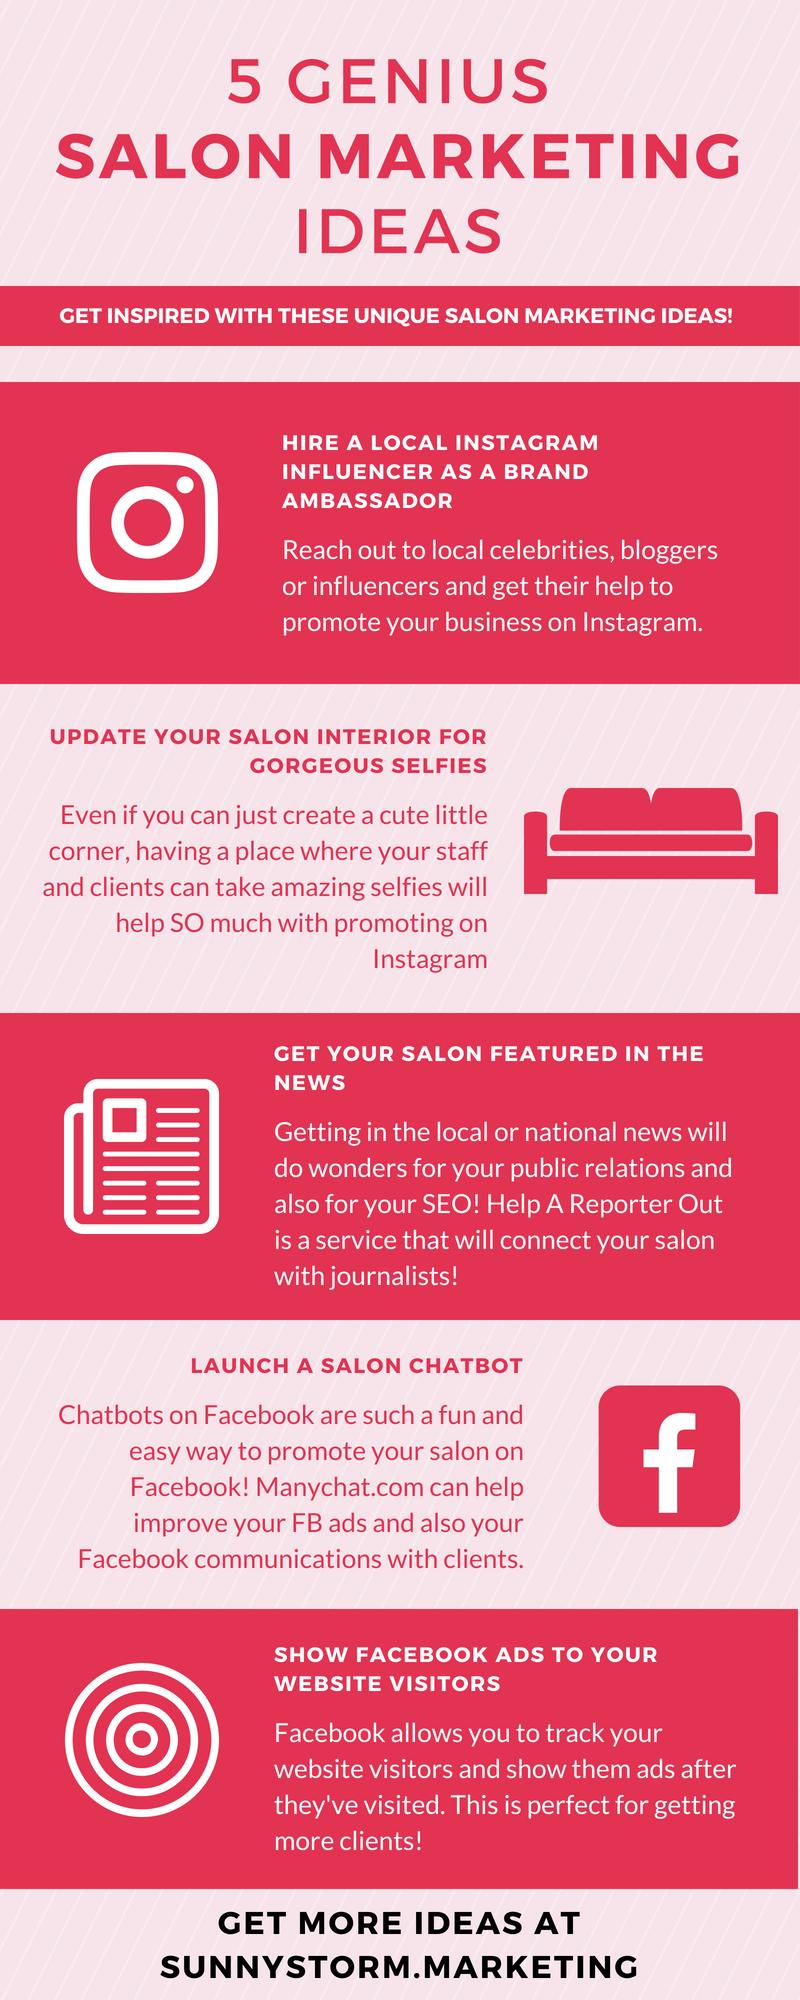 19 Genius Salon Marketing Ideas: Get ideas for promoting your salon